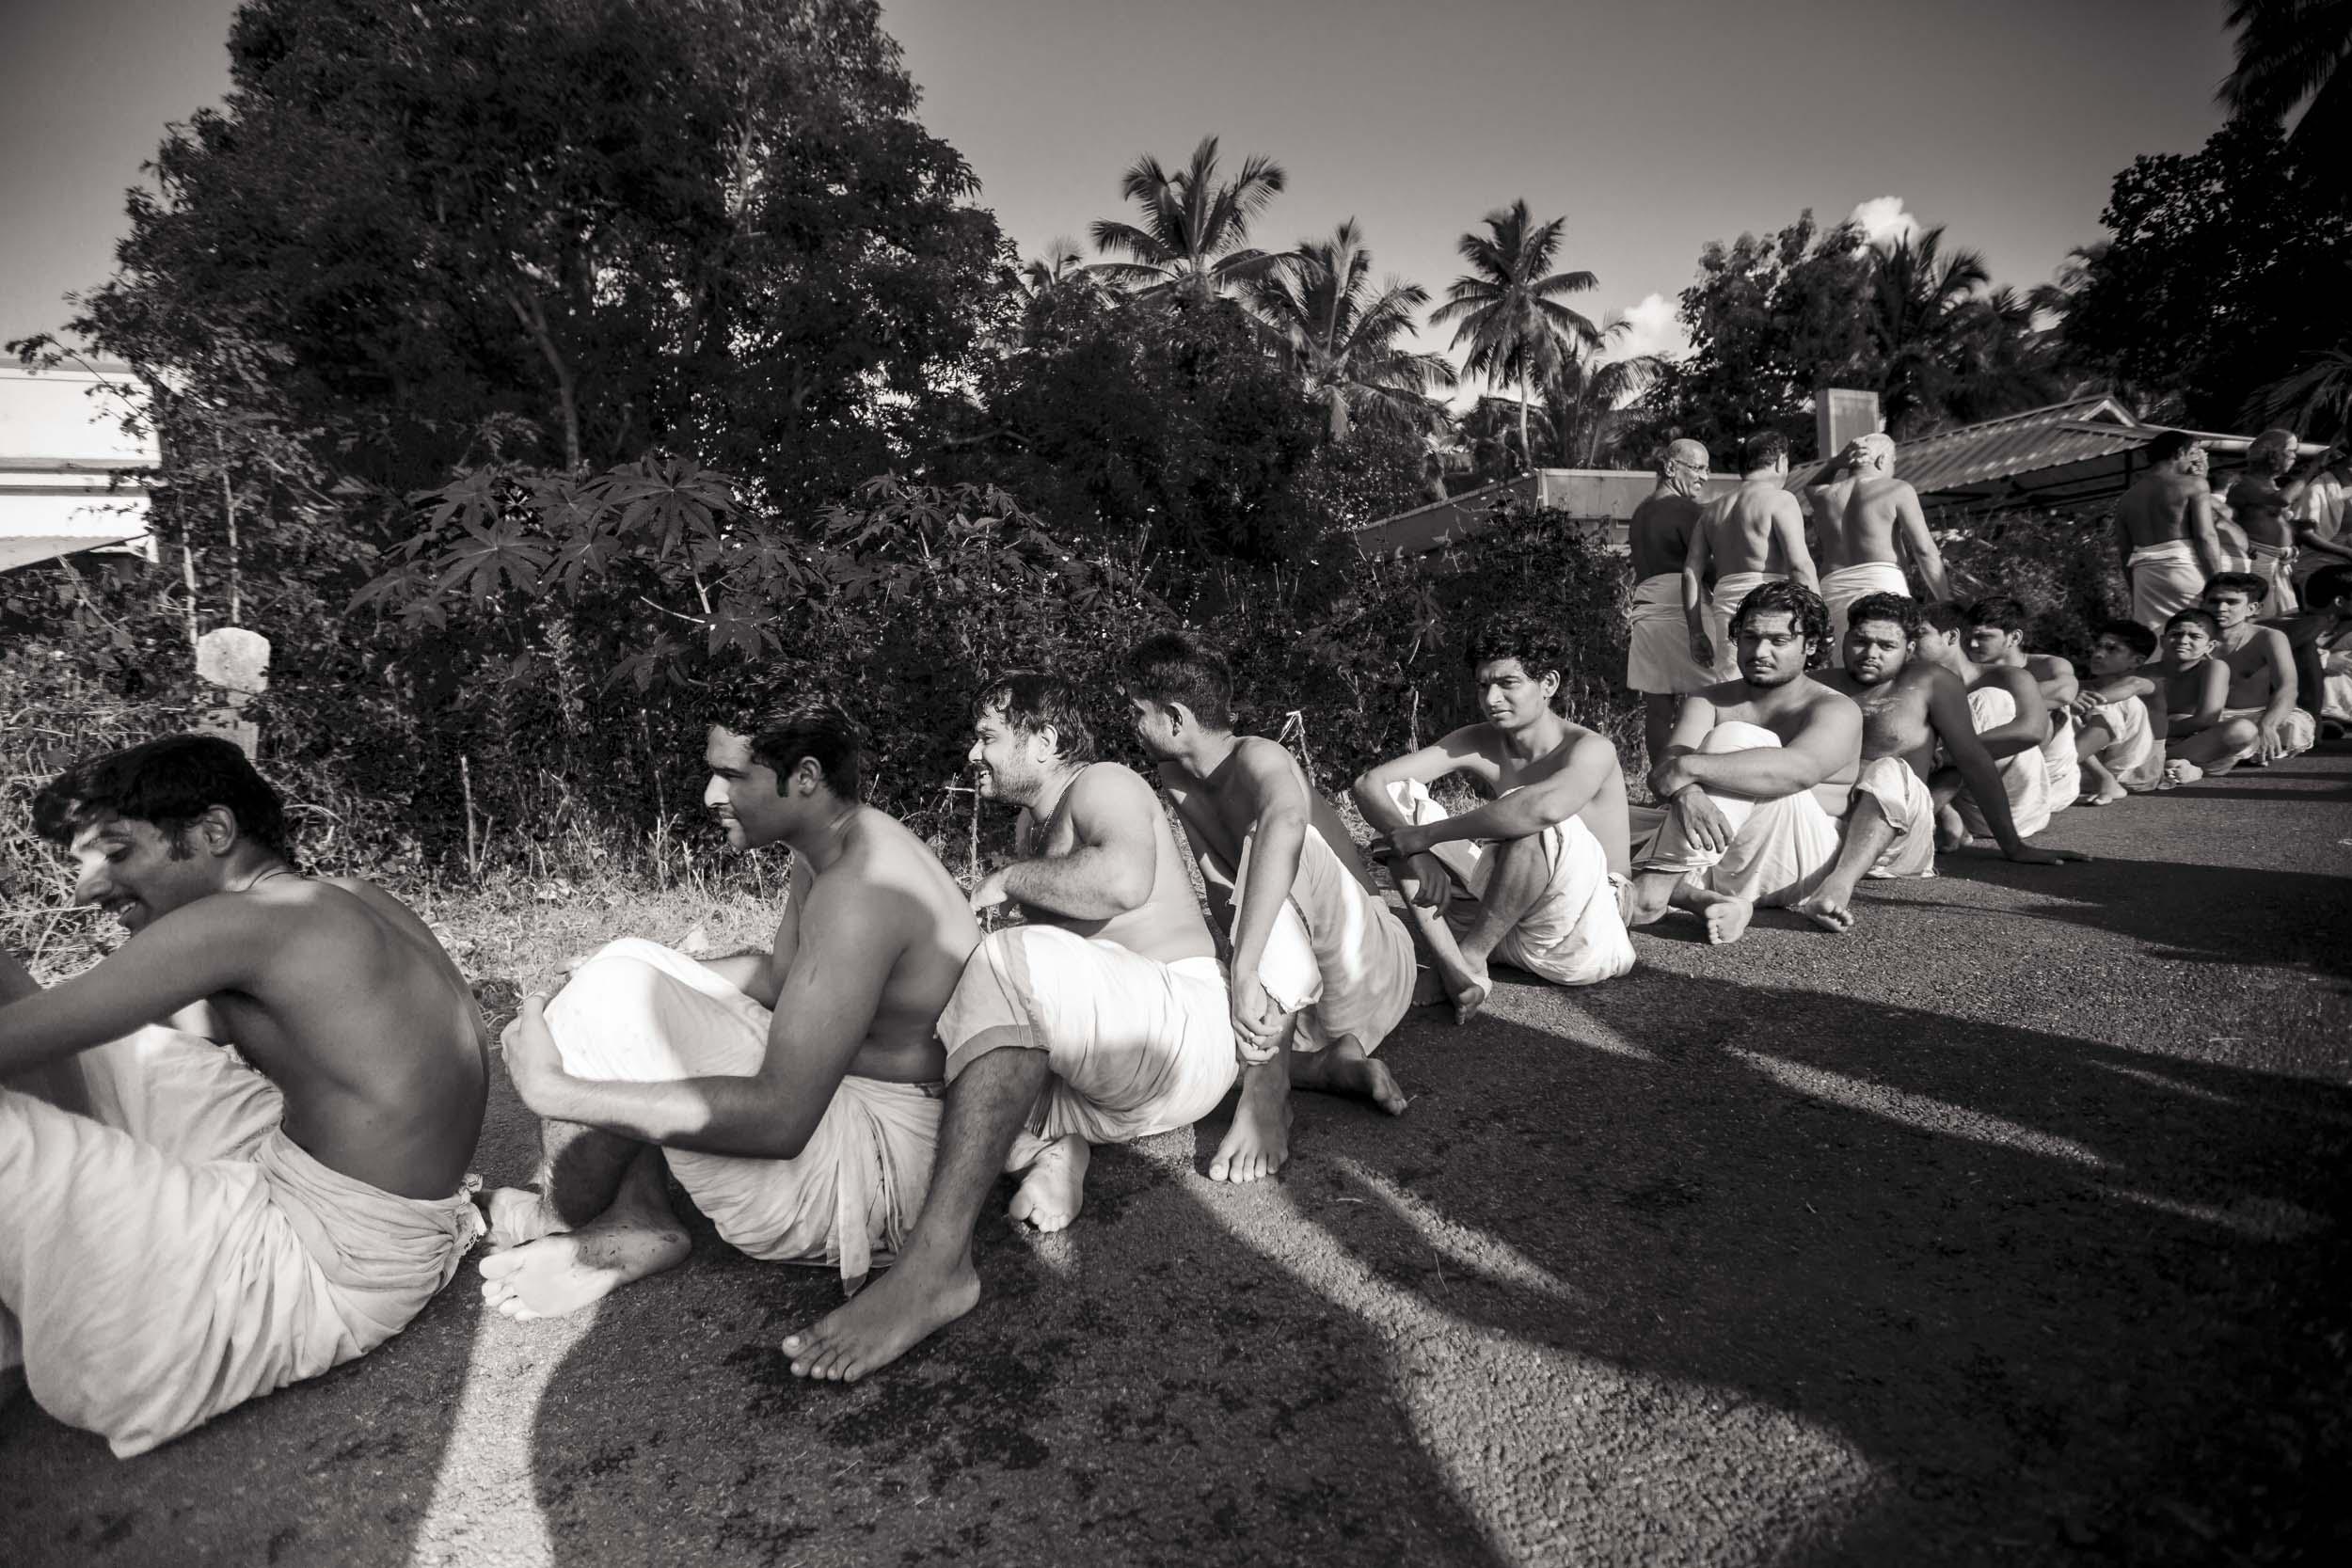 Sindhur_Photography_Travel_People_Kerala-47.JPG